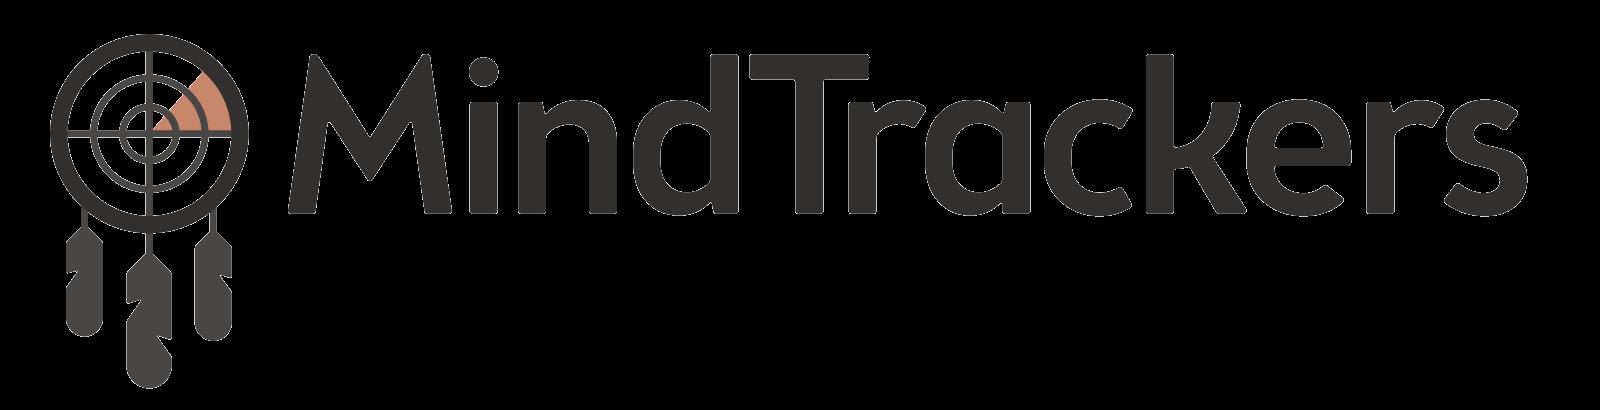 MindTrackers-final-logo